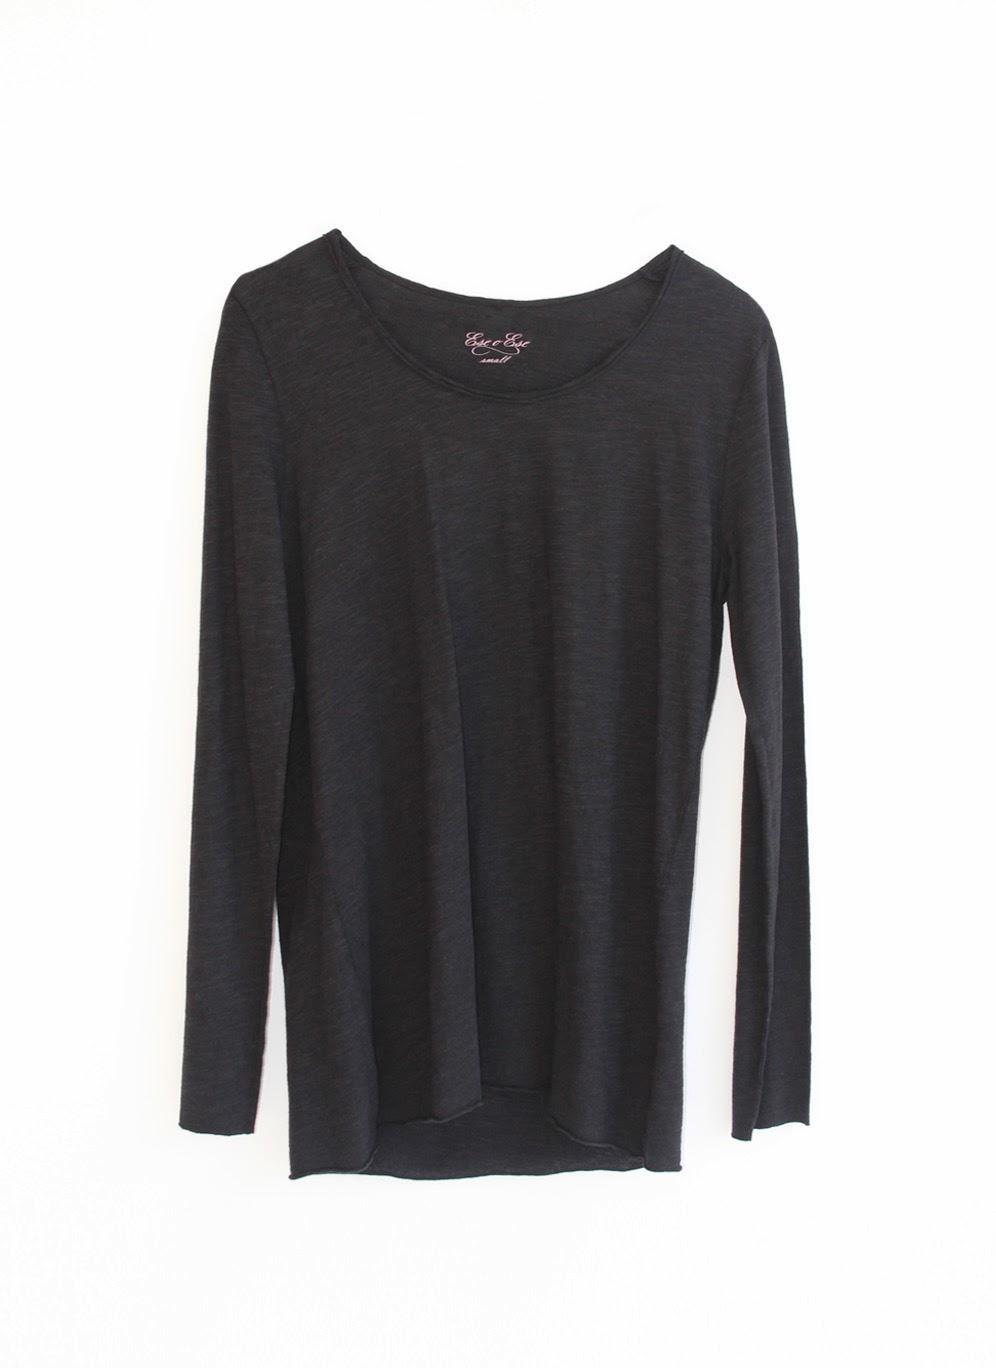 Camiseta básica en negro y manga larga de eseOese